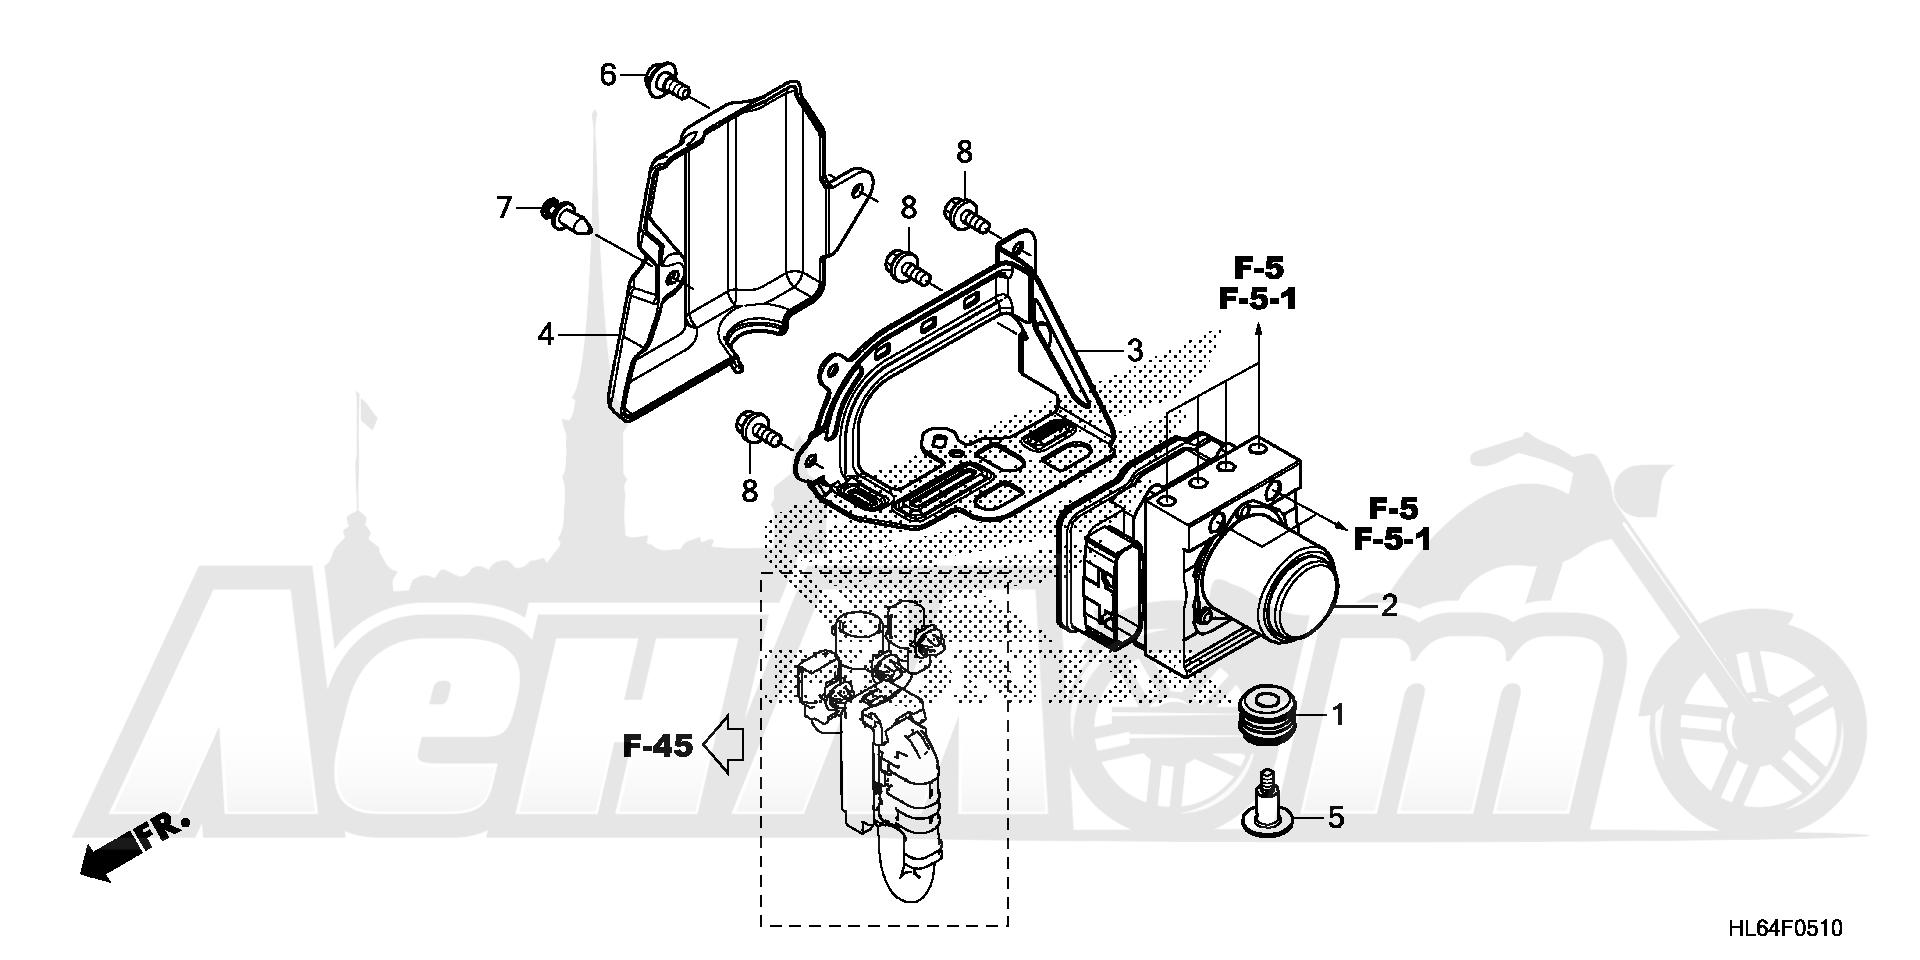 Запчасти для Квадроцикла Honda 2019 SXS1000S2R Раздел: VSA MODULATOR | VSA MODULATOR